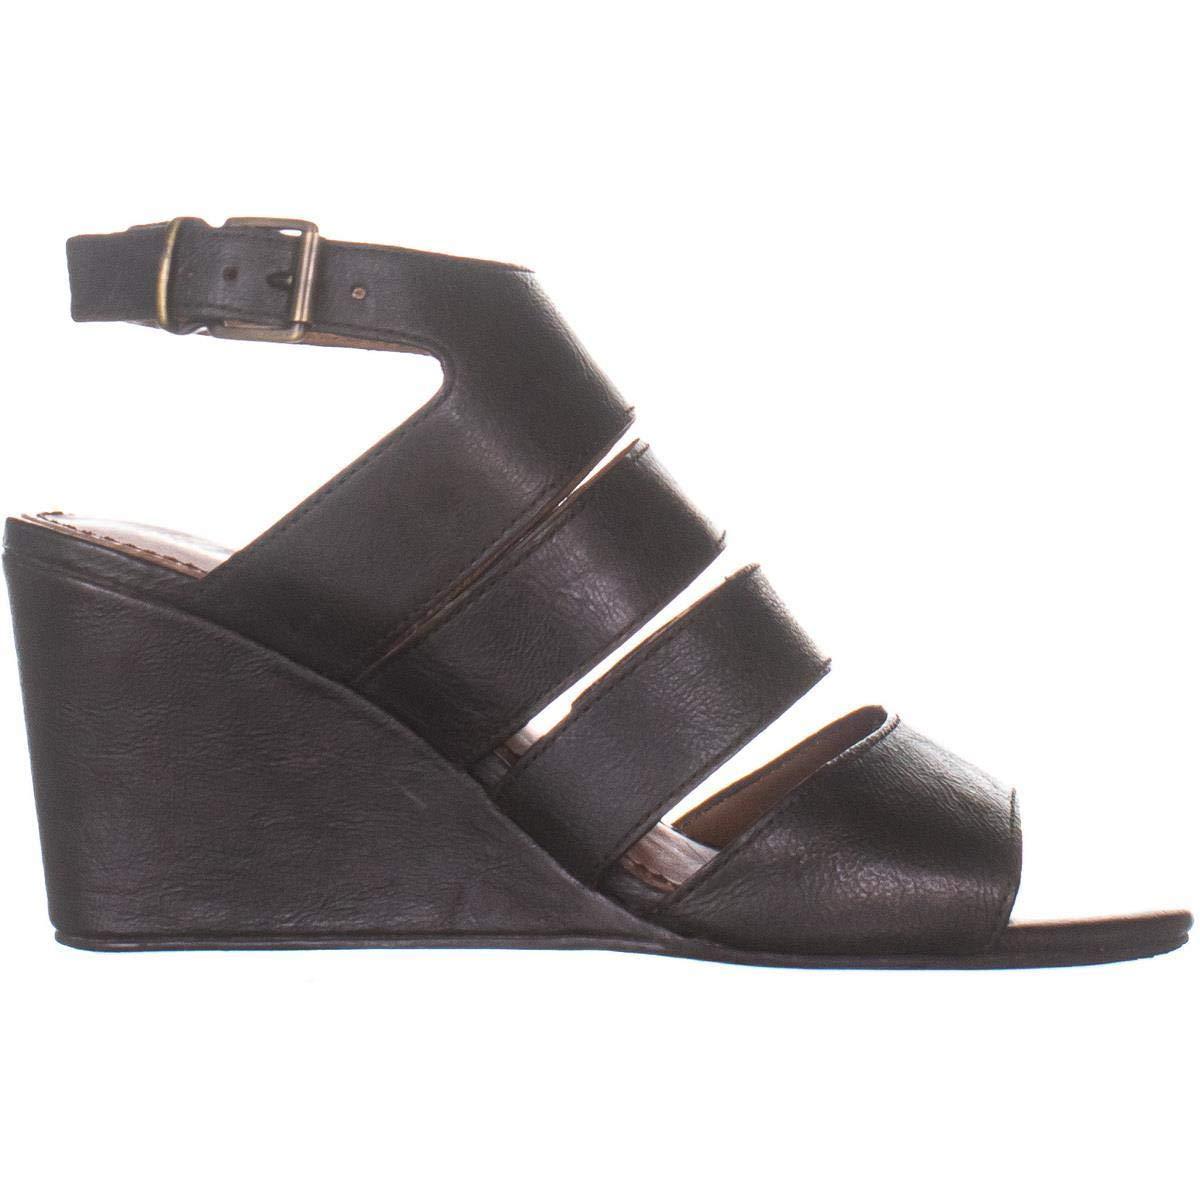 Patricia Nash Womens Korina Leather Wedge Wedge Sandals